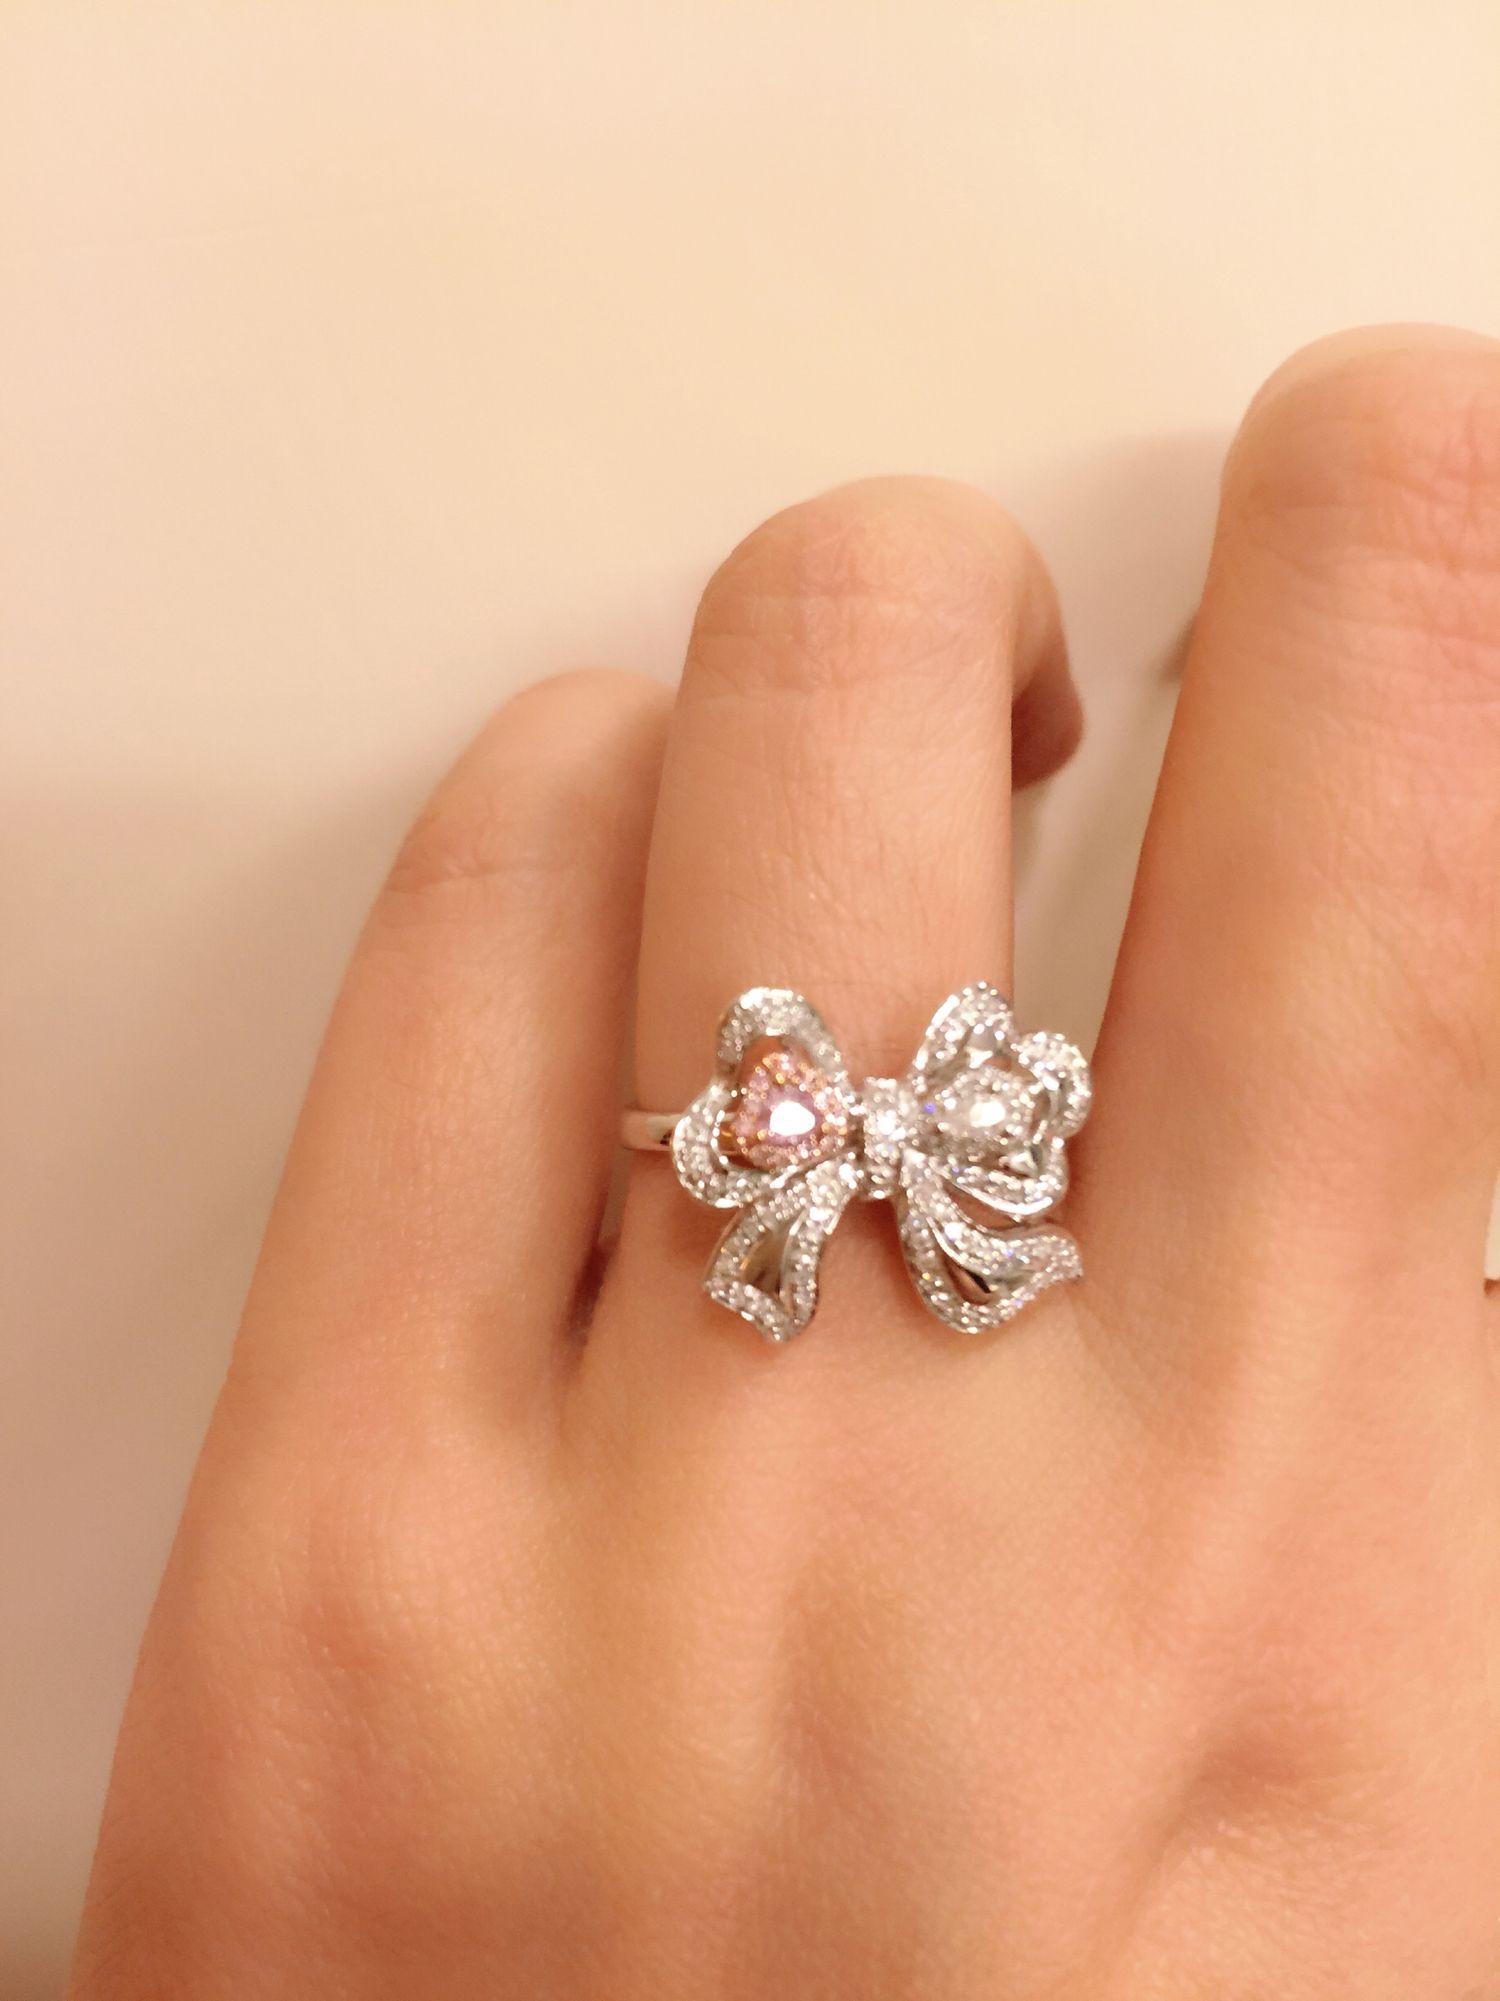 Pink Diamond And Ribbon Ring Set In 18k White Gold: Pink Bow Wedding Ring At Reisefeber.org